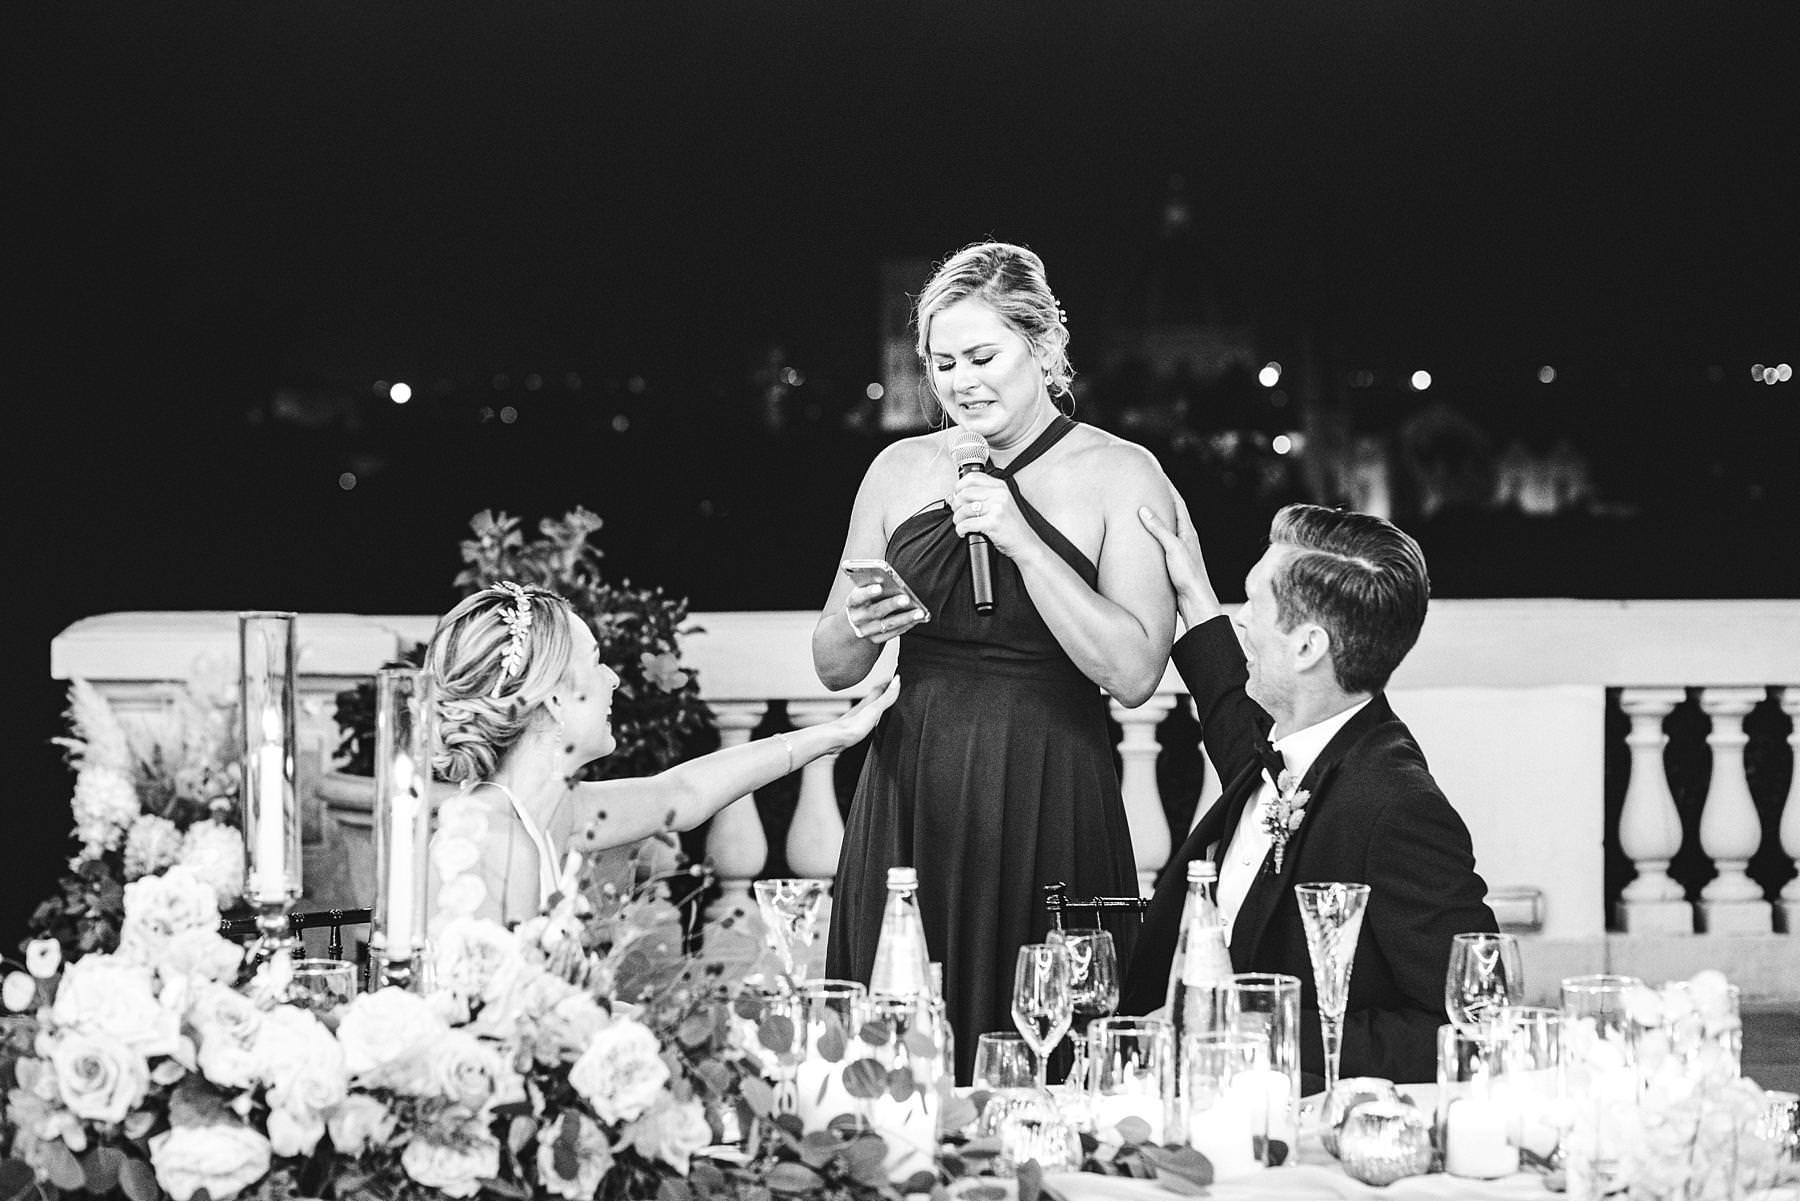 Emotional speech at wedding reception at Villa La Vedetta, Florence